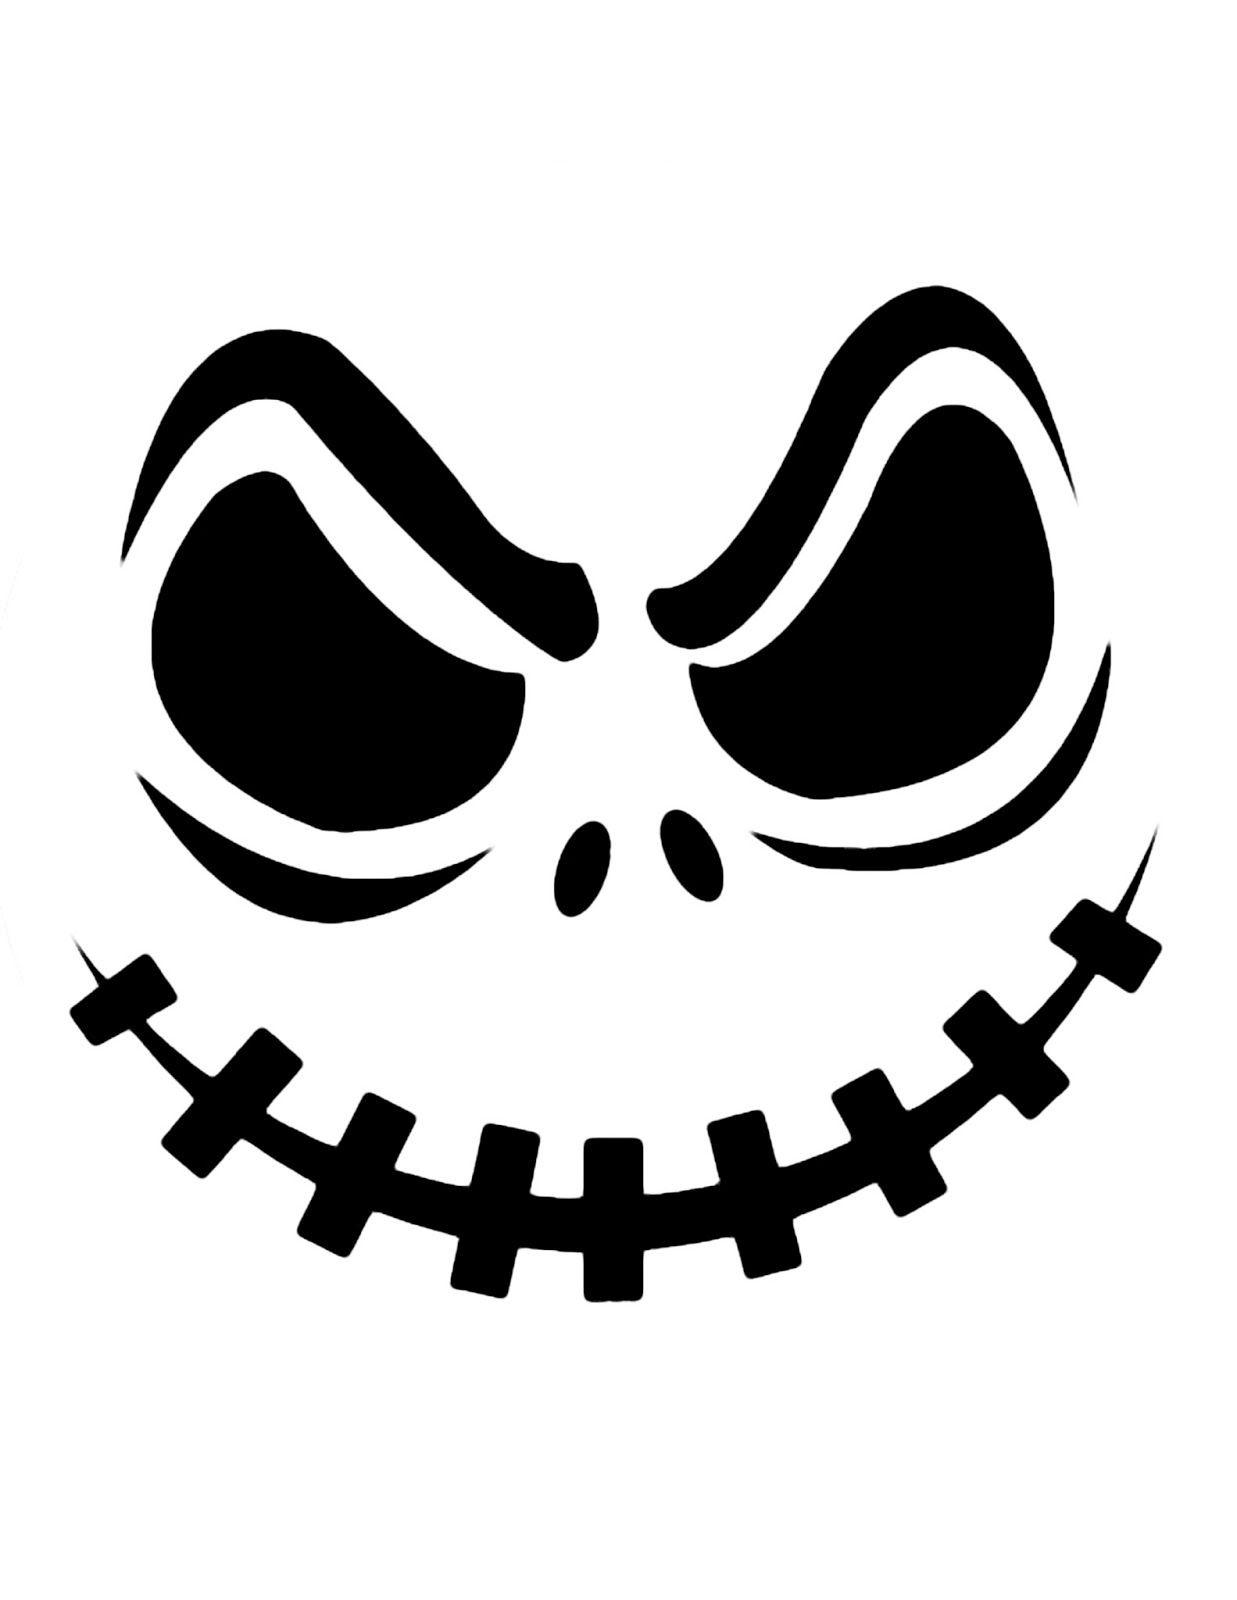 Top Printable Scary Face Pumpkin Carving Pattern Design Stencils - Pumpkin Patterns Free Printable